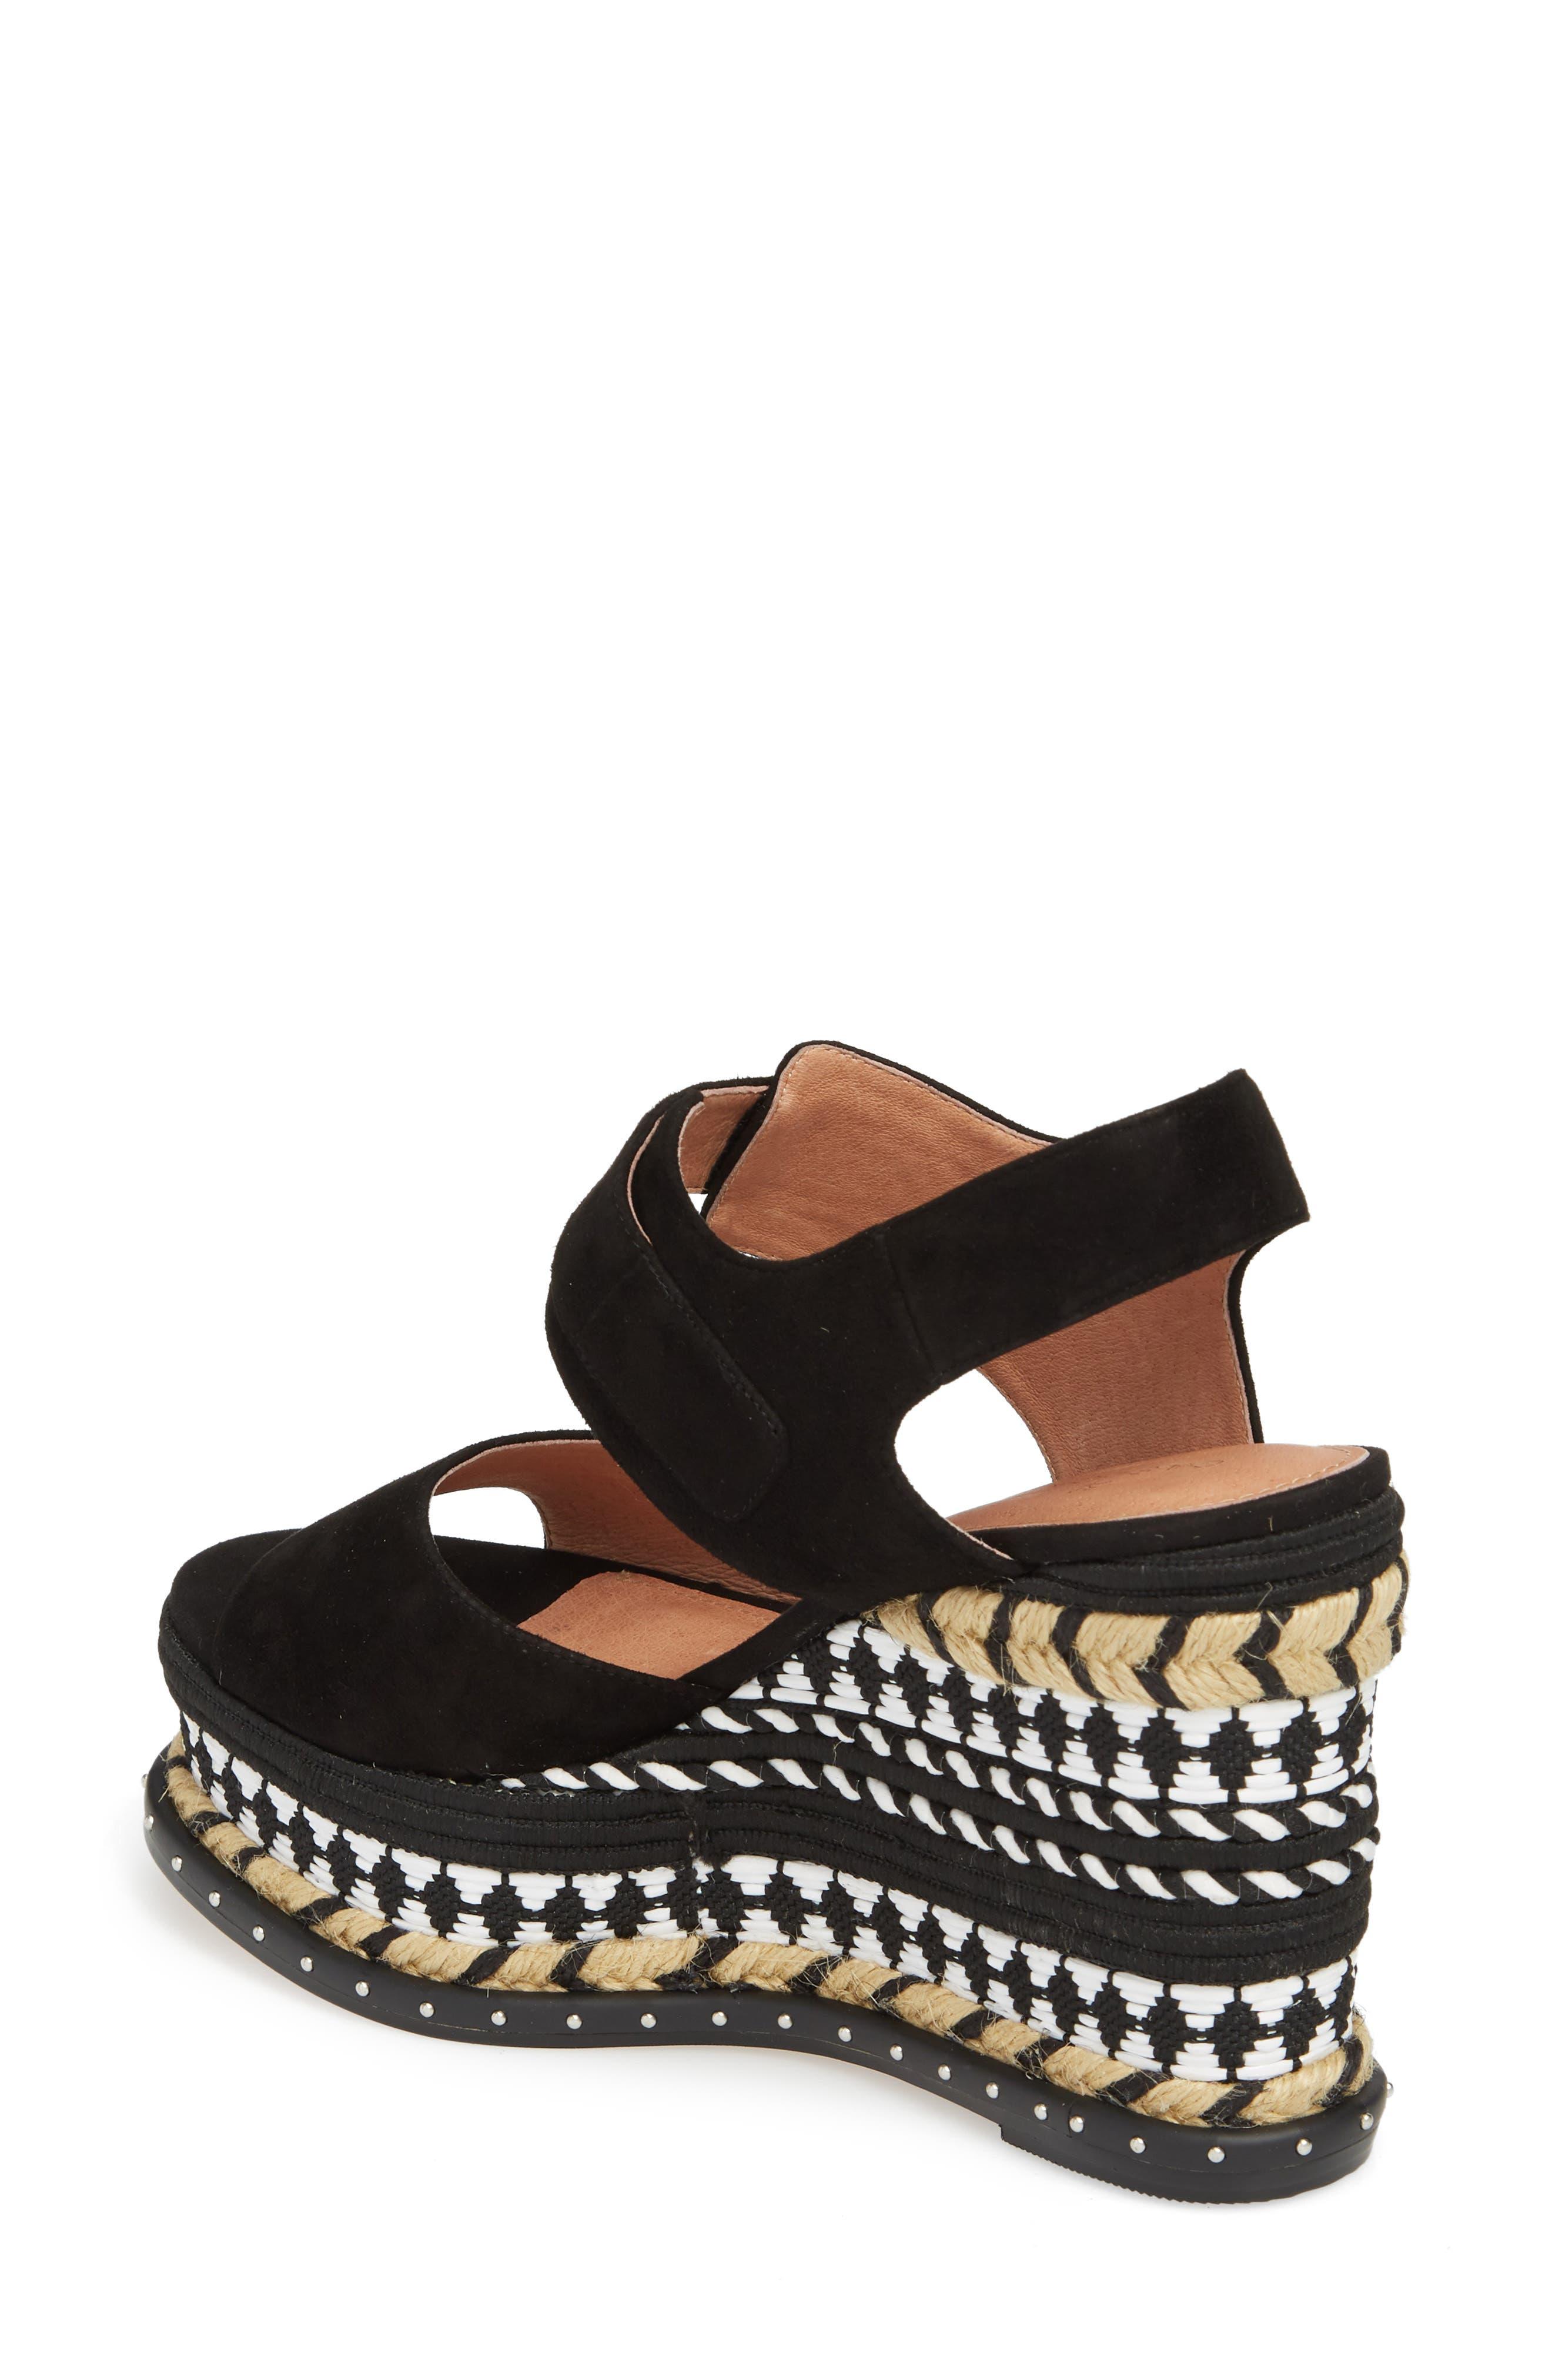 Braxton Platform Wedge Sandal,                             Alternate thumbnail 3, color,